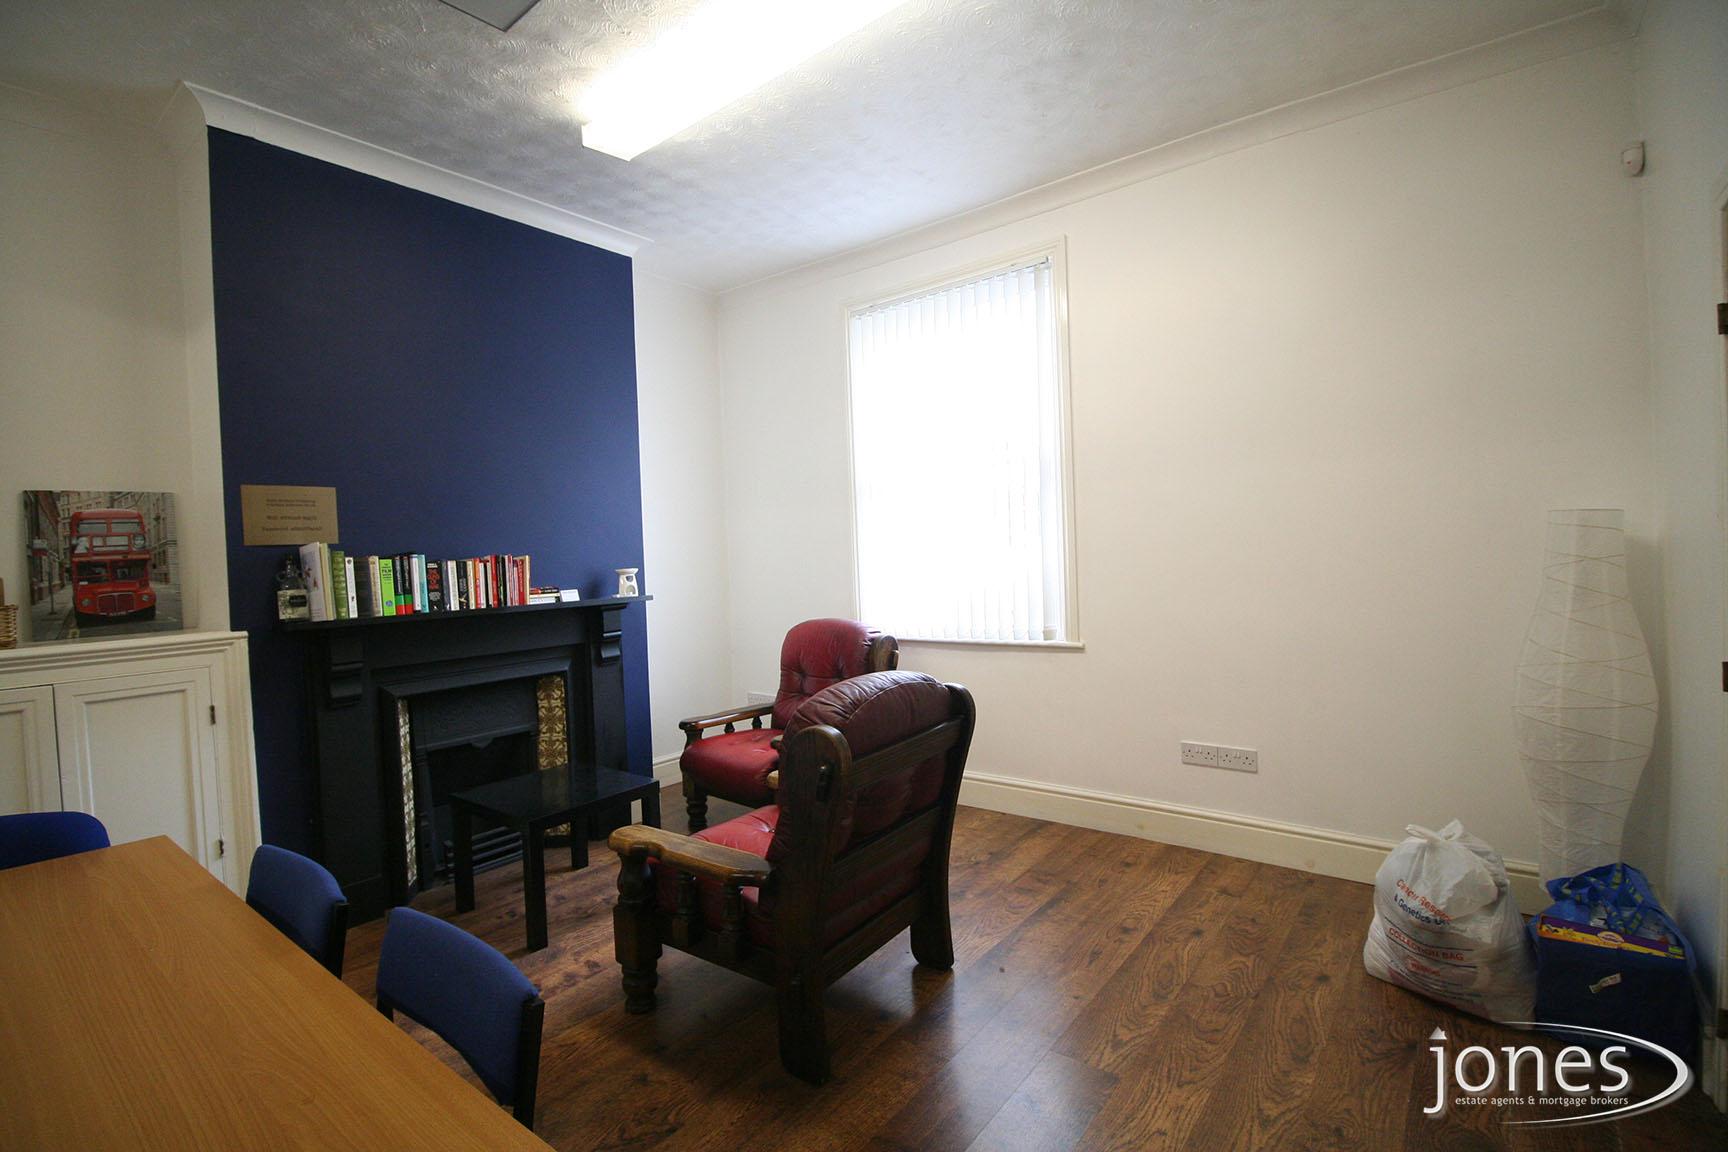 Home for Sale Let - Photo 05 The Green (Suite 2),Billingham TS23 1EU